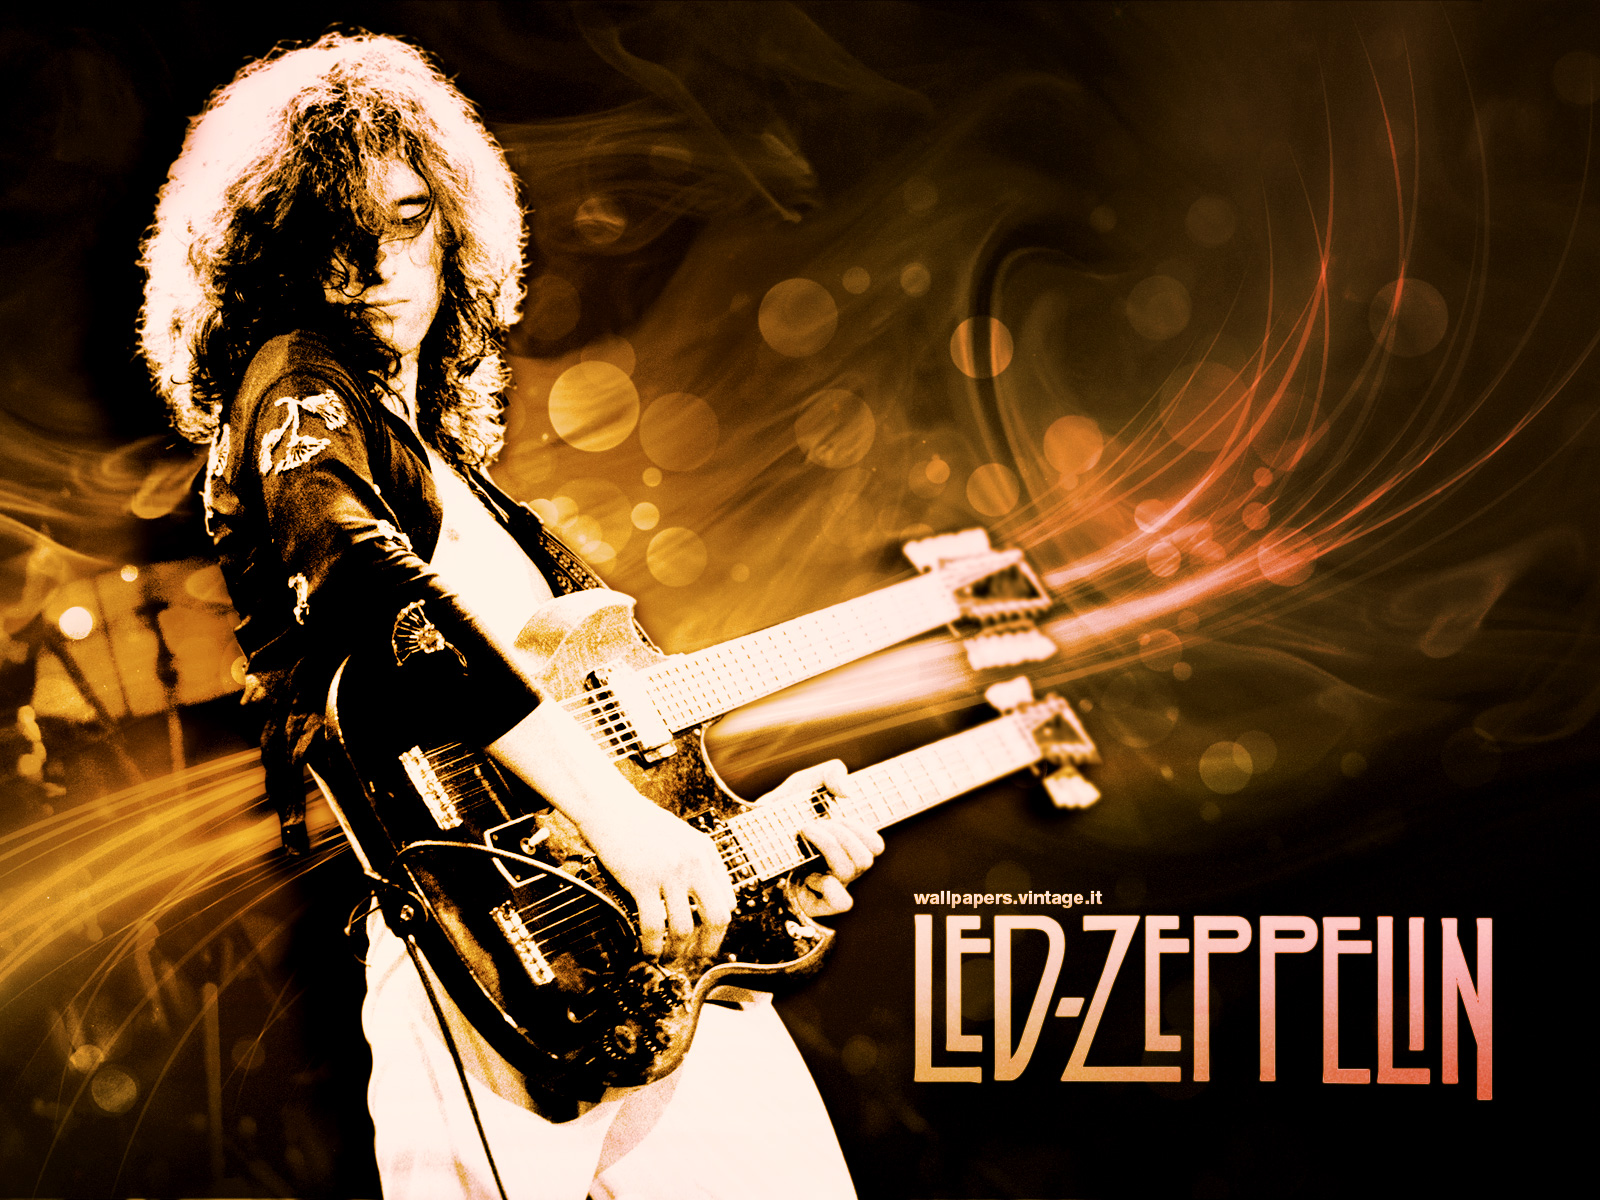 Led Zeppelin wallpaper   Desktop HD iPad iPhone 1600x1200